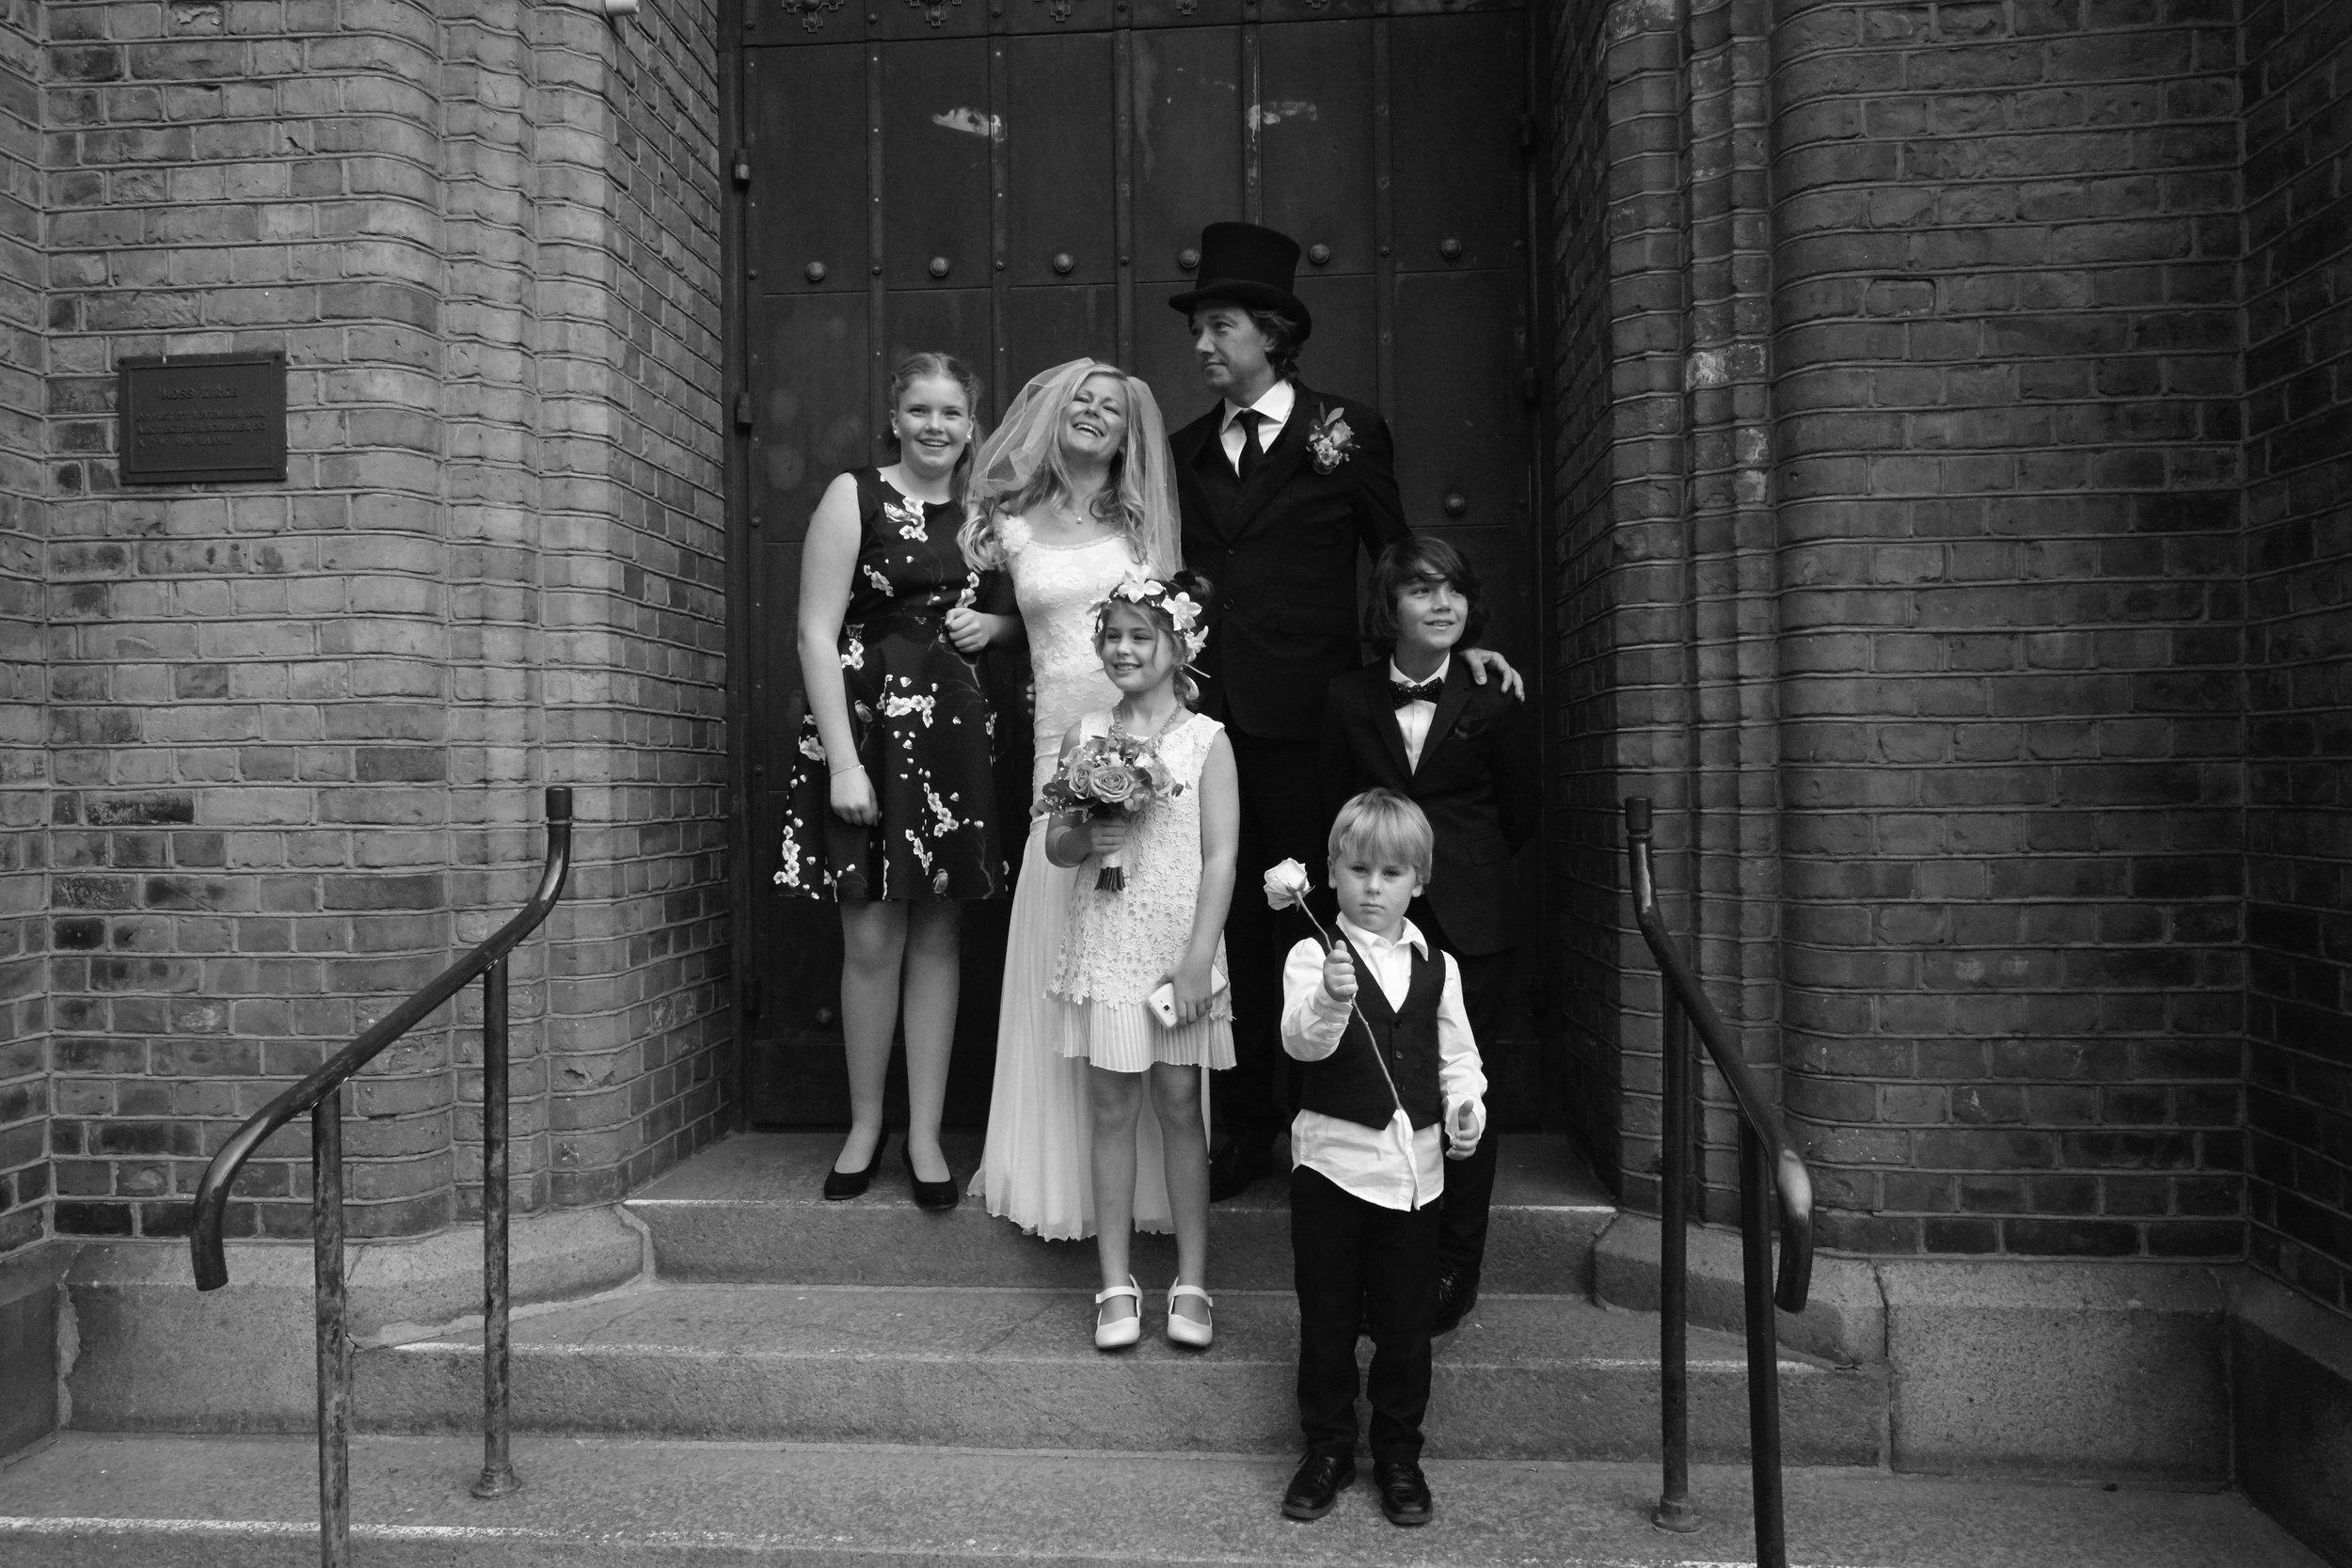 lone bryllup 177.jpg